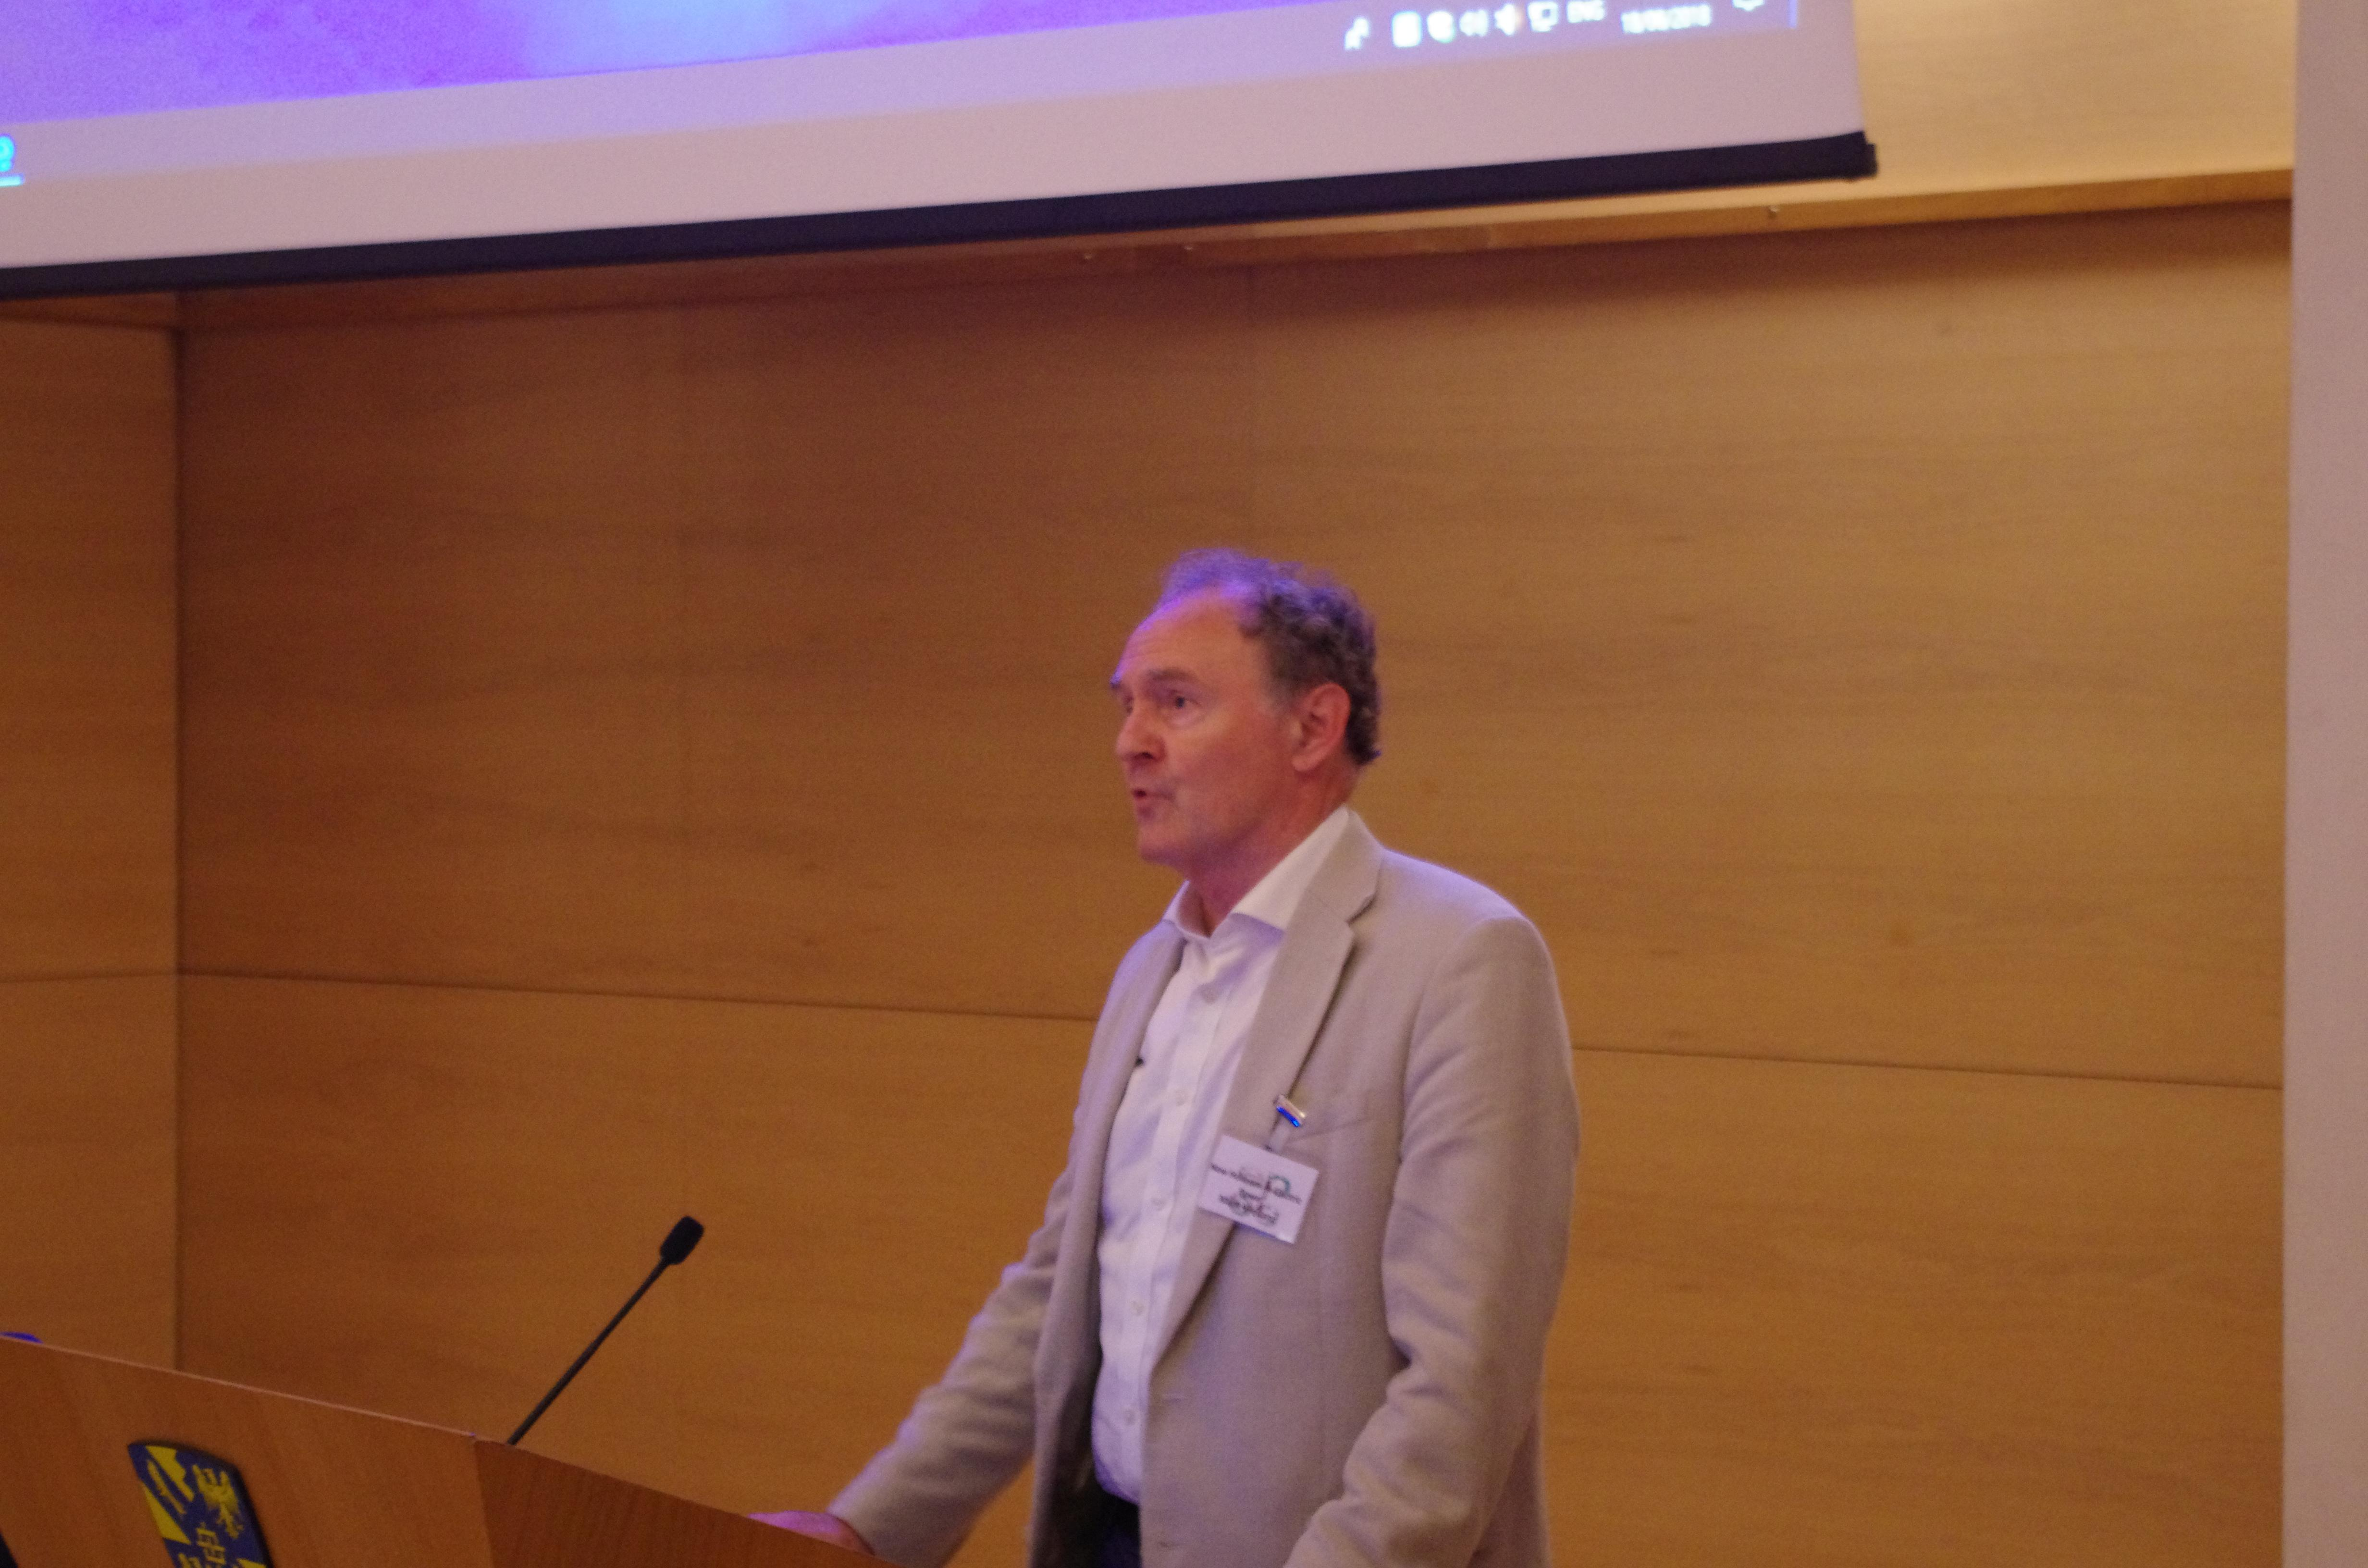 Professor Sir Mark Welland